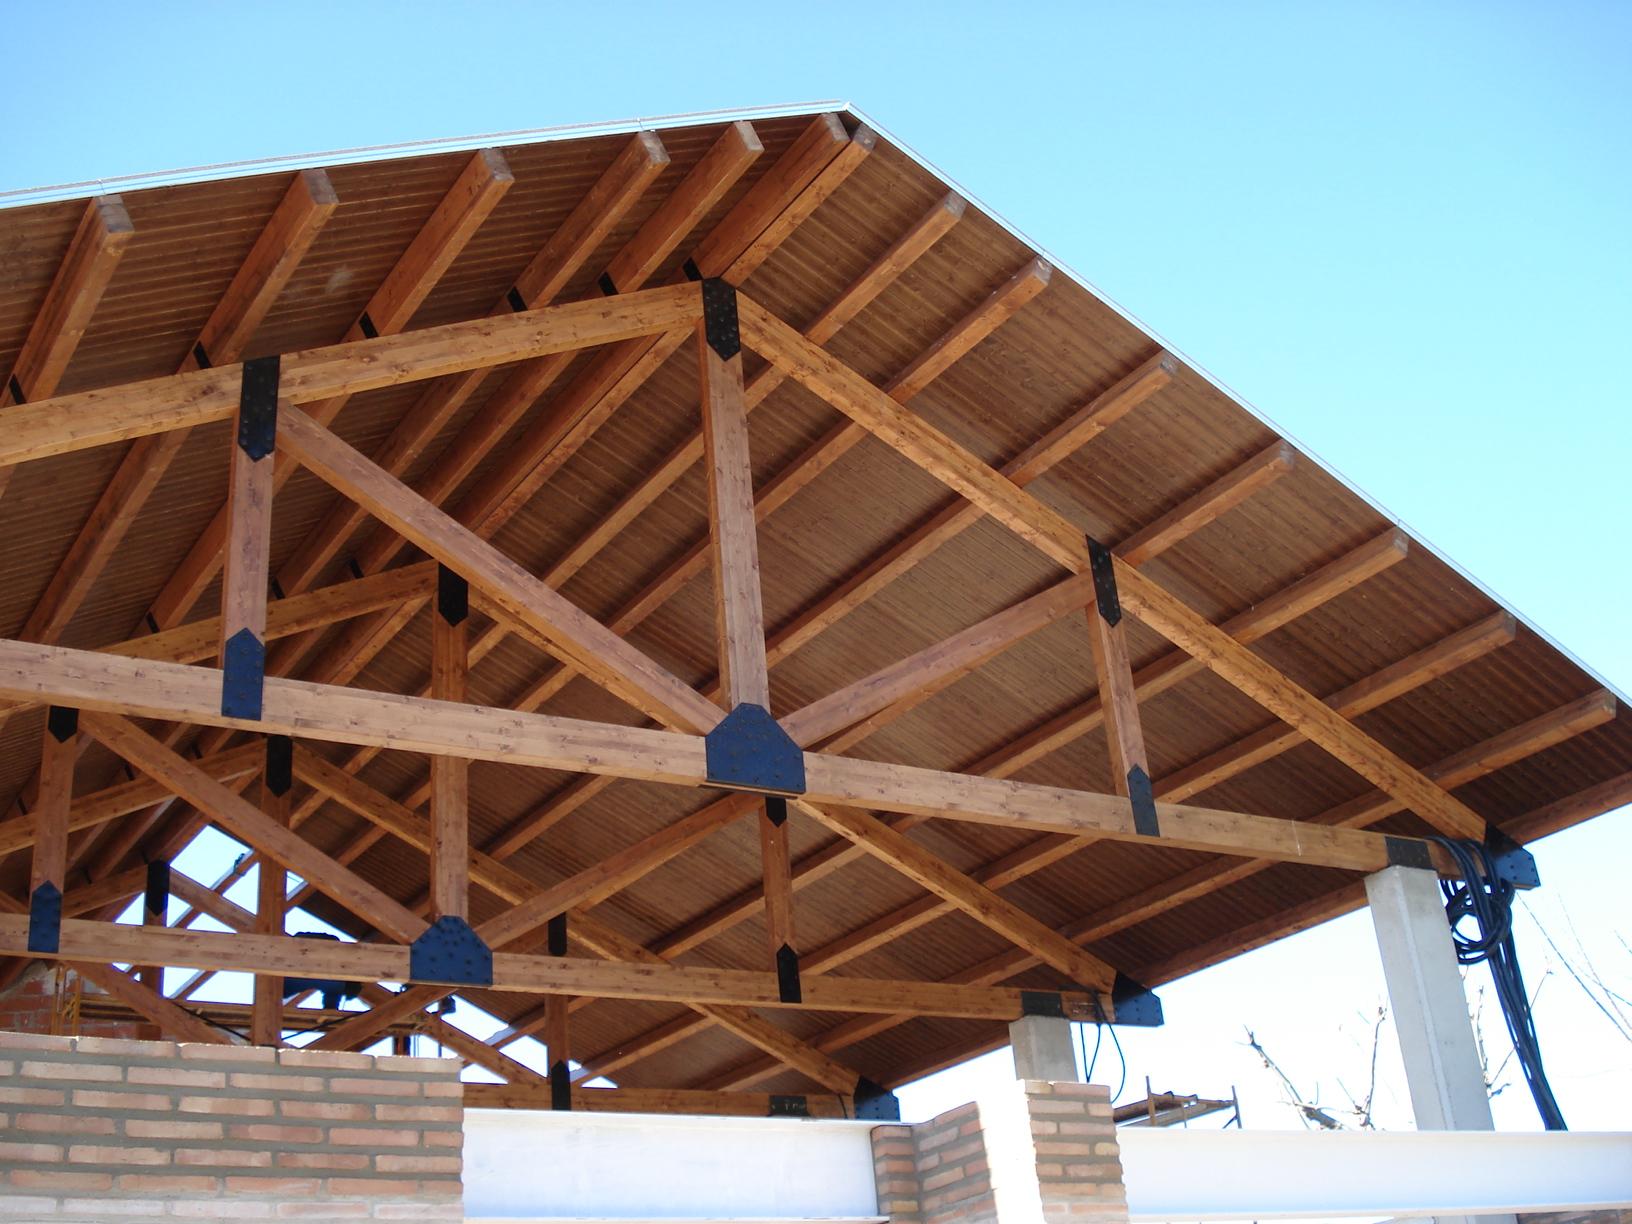 Grandes luces incofusta fabrica de madera en valencia for Tejados de madera a 4 aguas